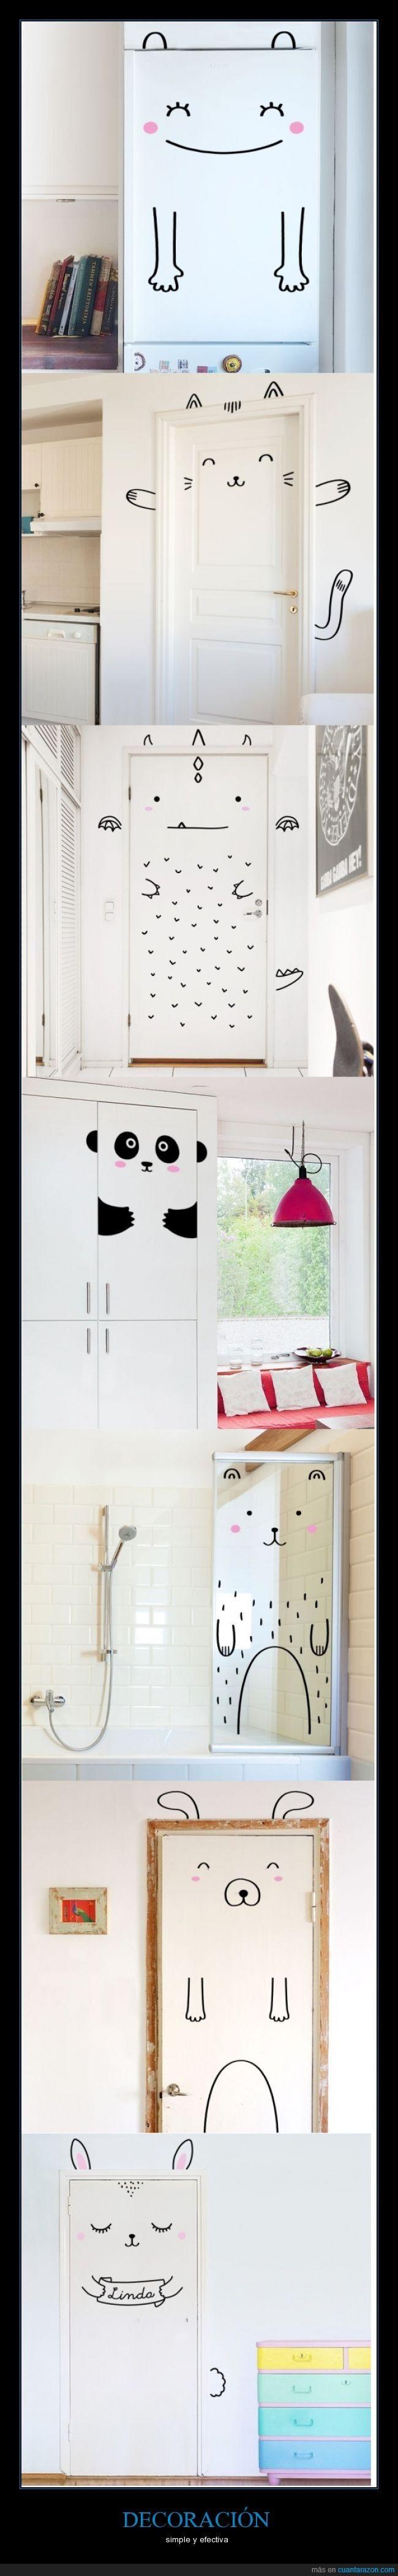 Diy wall art for kids bedrooms and playrooms diy home kids